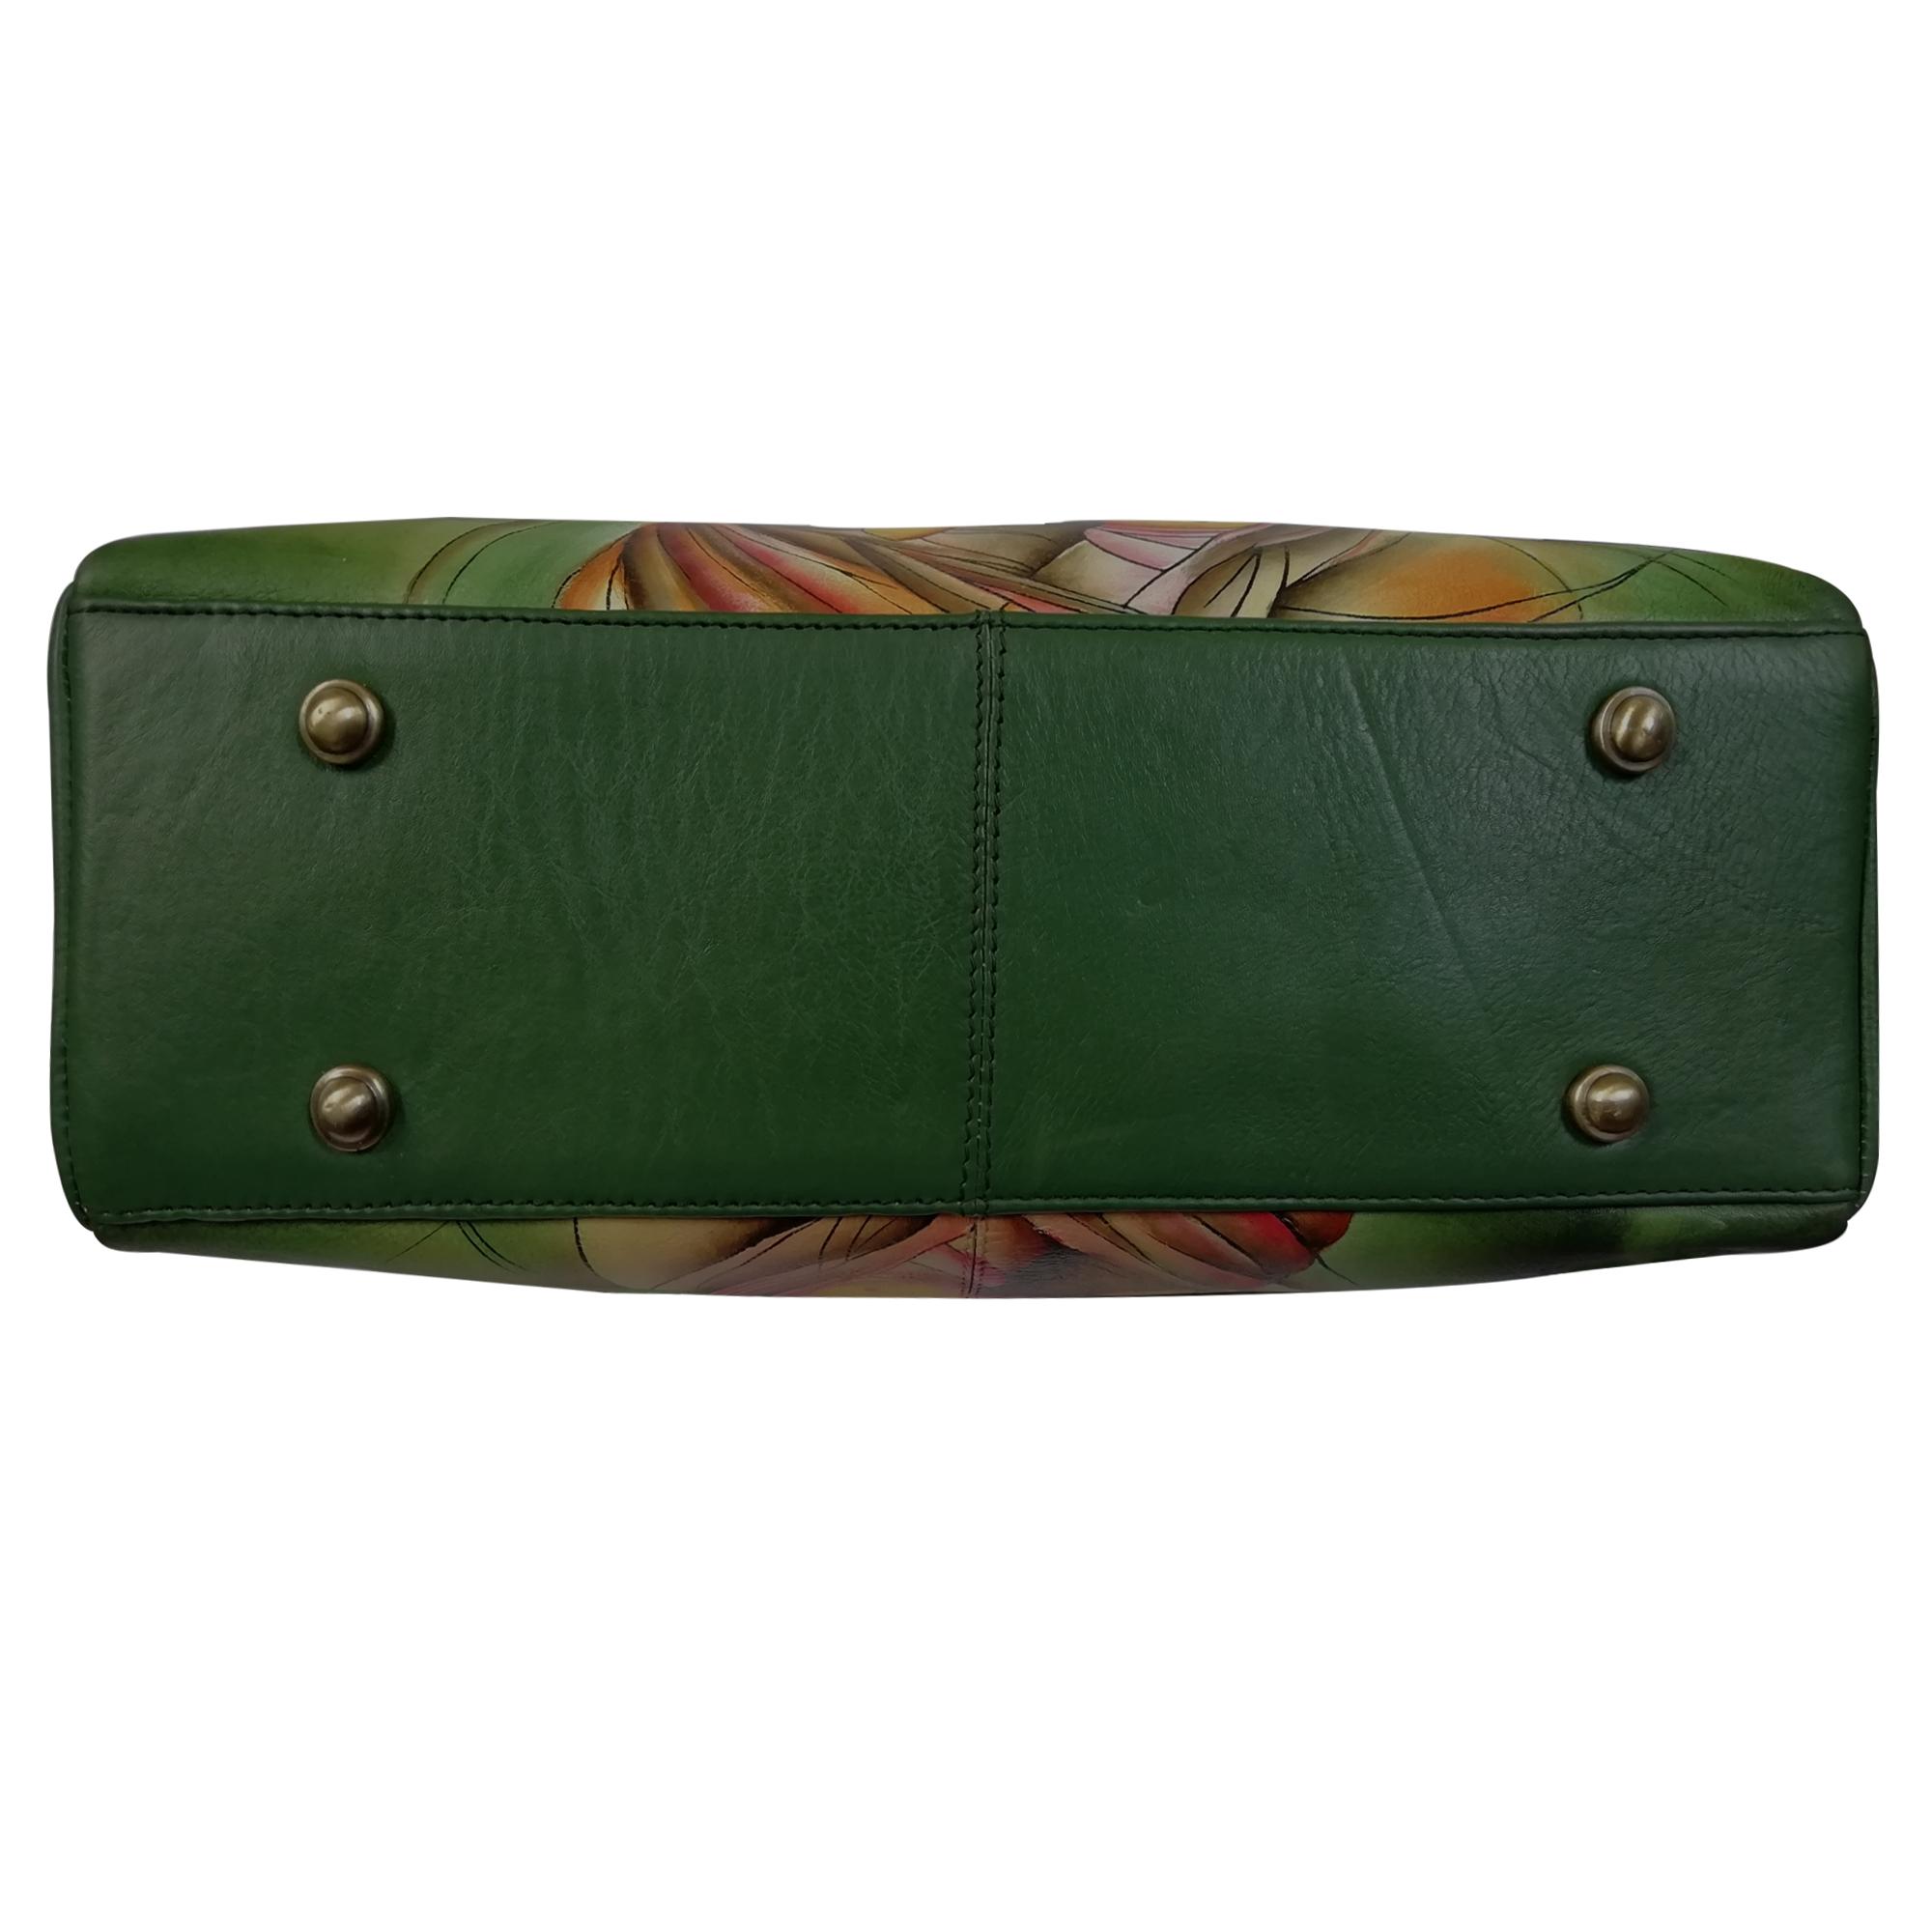 New Leather Hand Painted Shoulder Handbag Design Radha Krishna